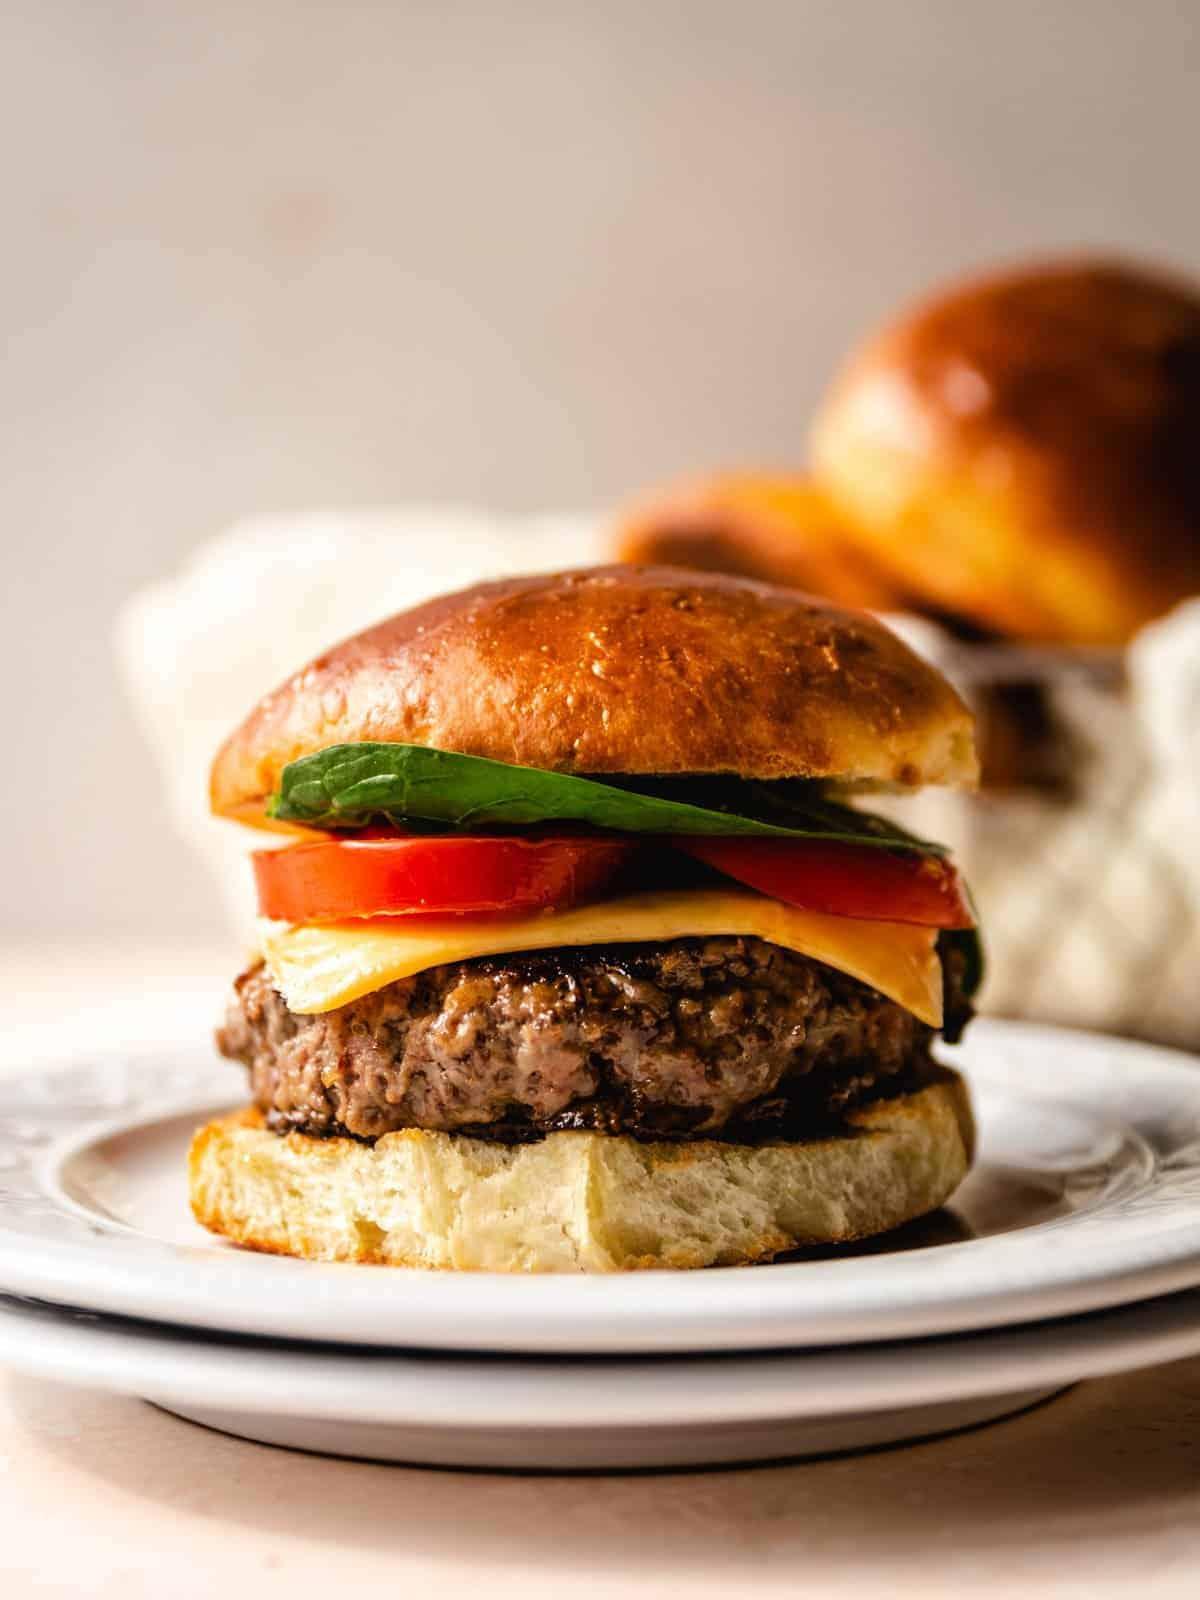 burger with brioche bun